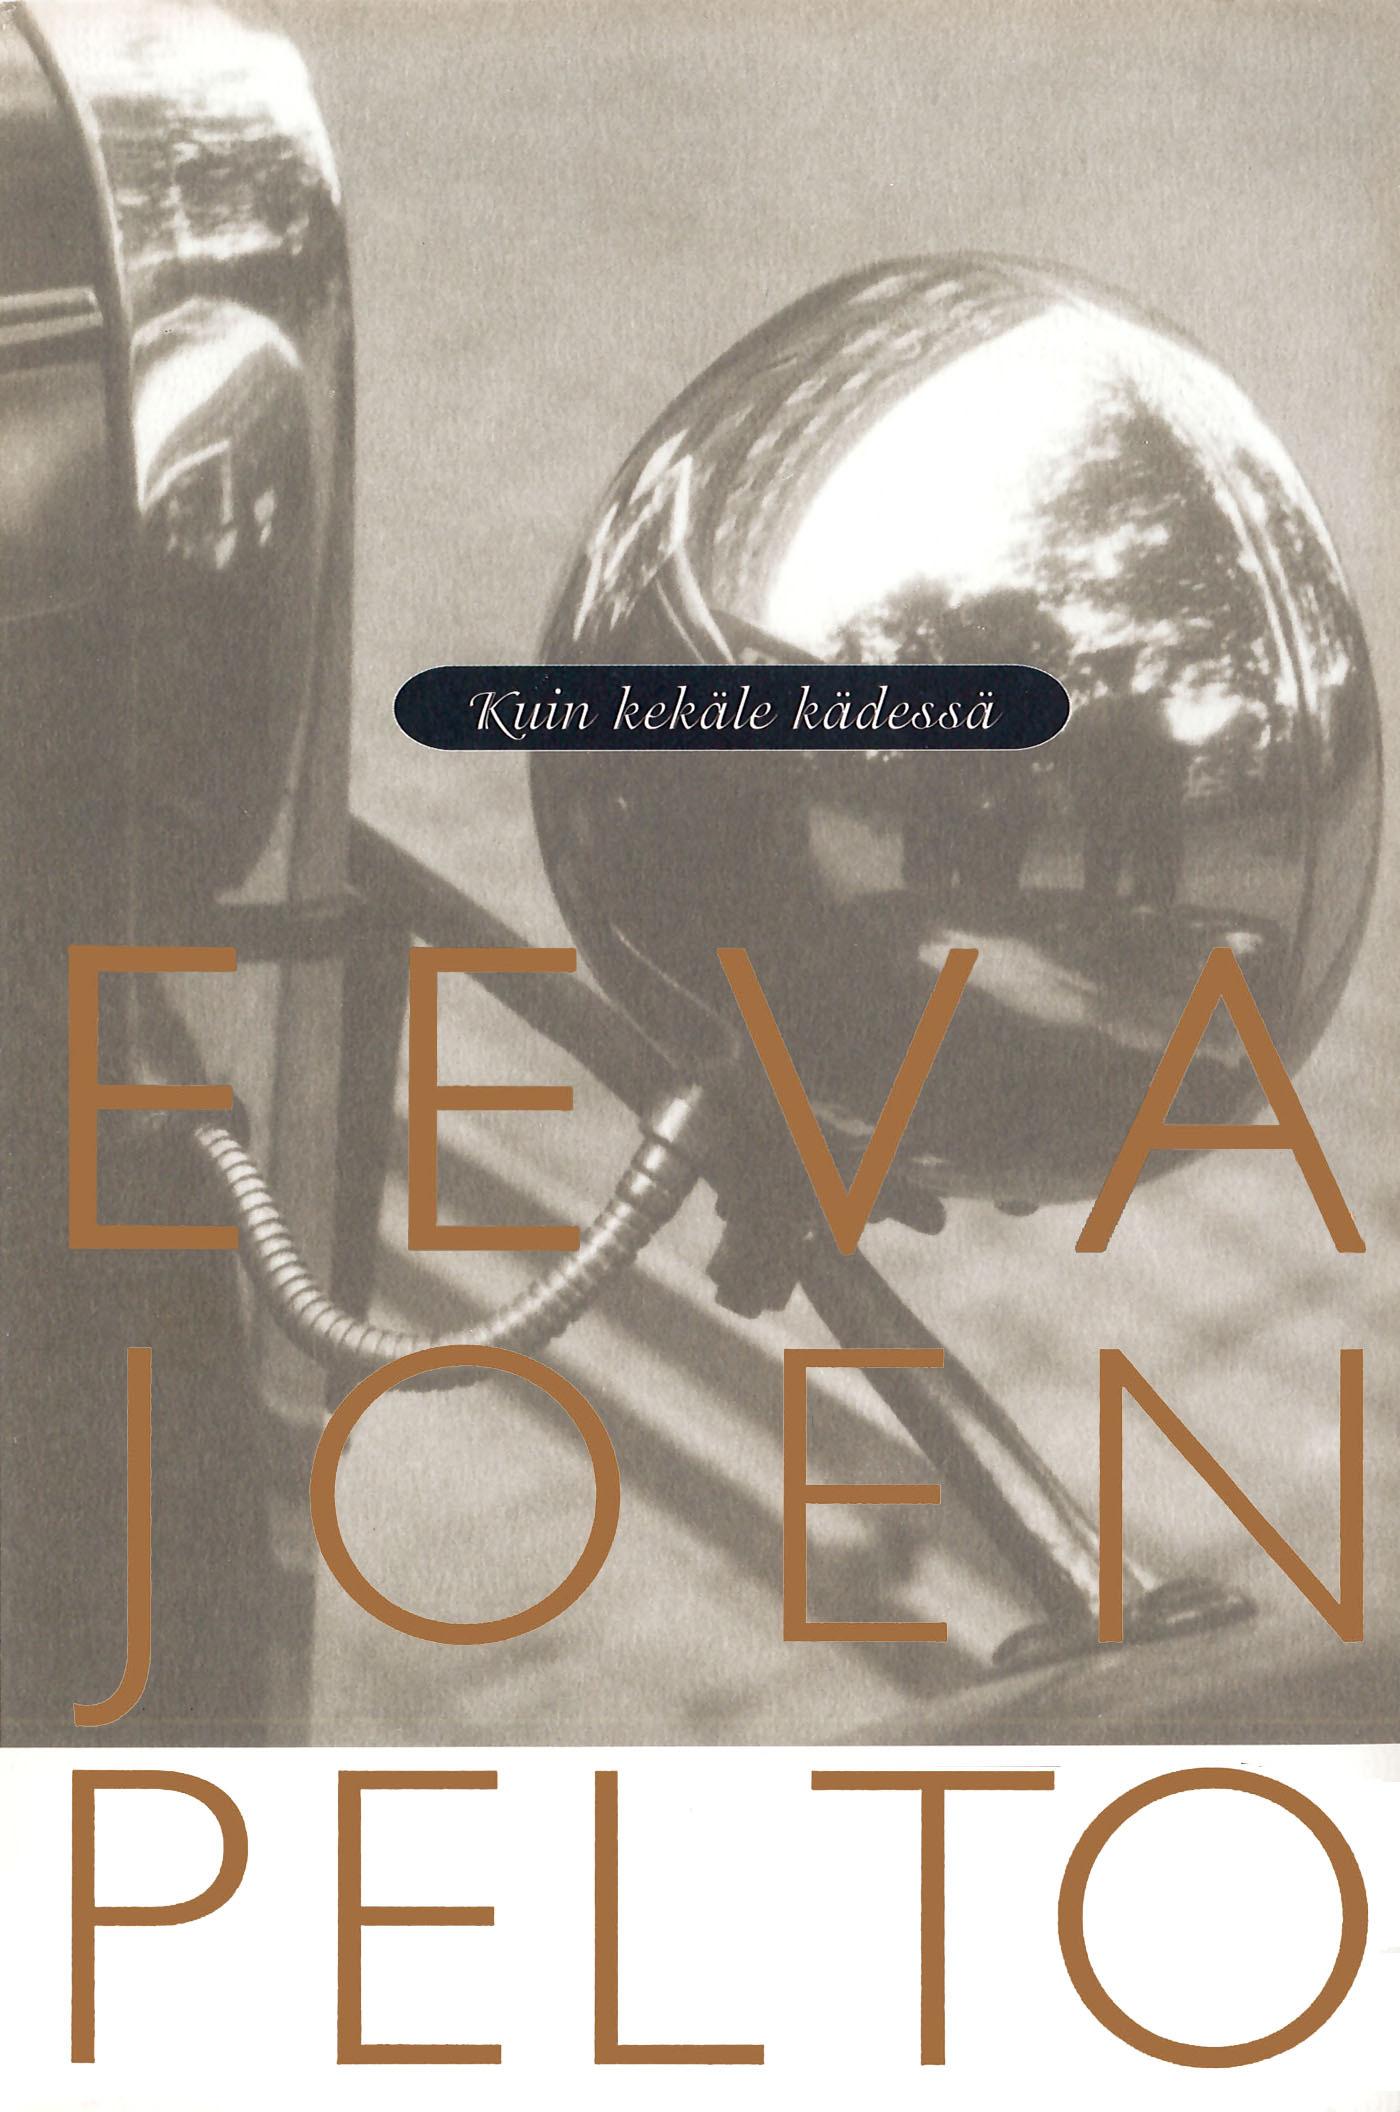 Joenpelto, Eeva - Kuin kekäle kädessä: Lohja II, ebook